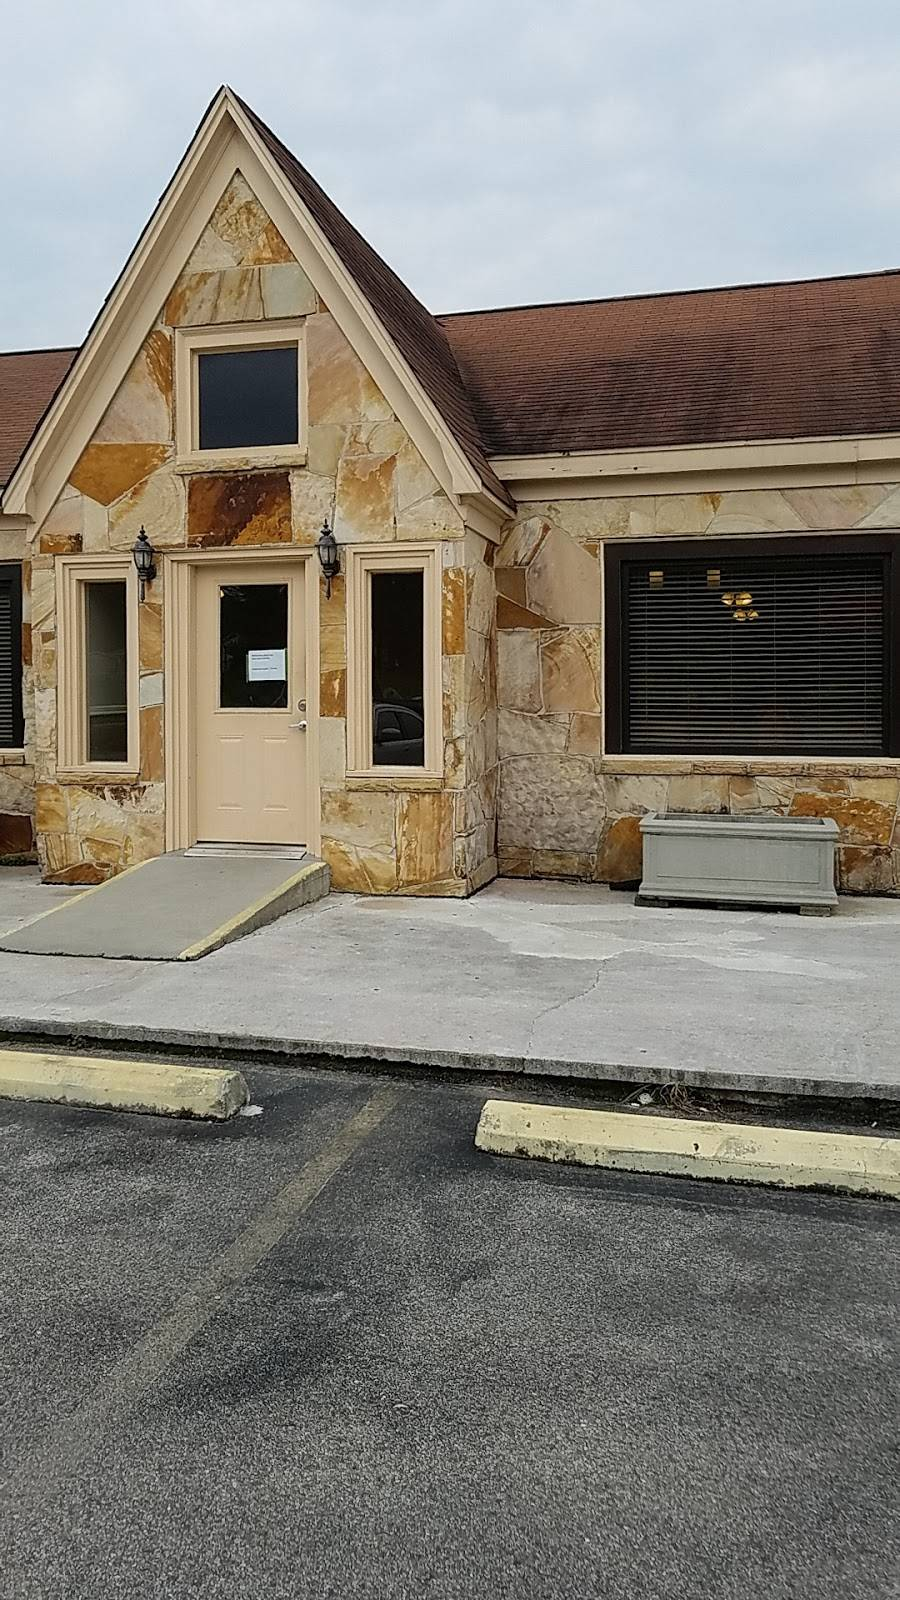 Cuevas Fish House | restaurant | 5781 US-11, Purvis, MS 39475, USA | 6017443474 OR +1 601-744-3474